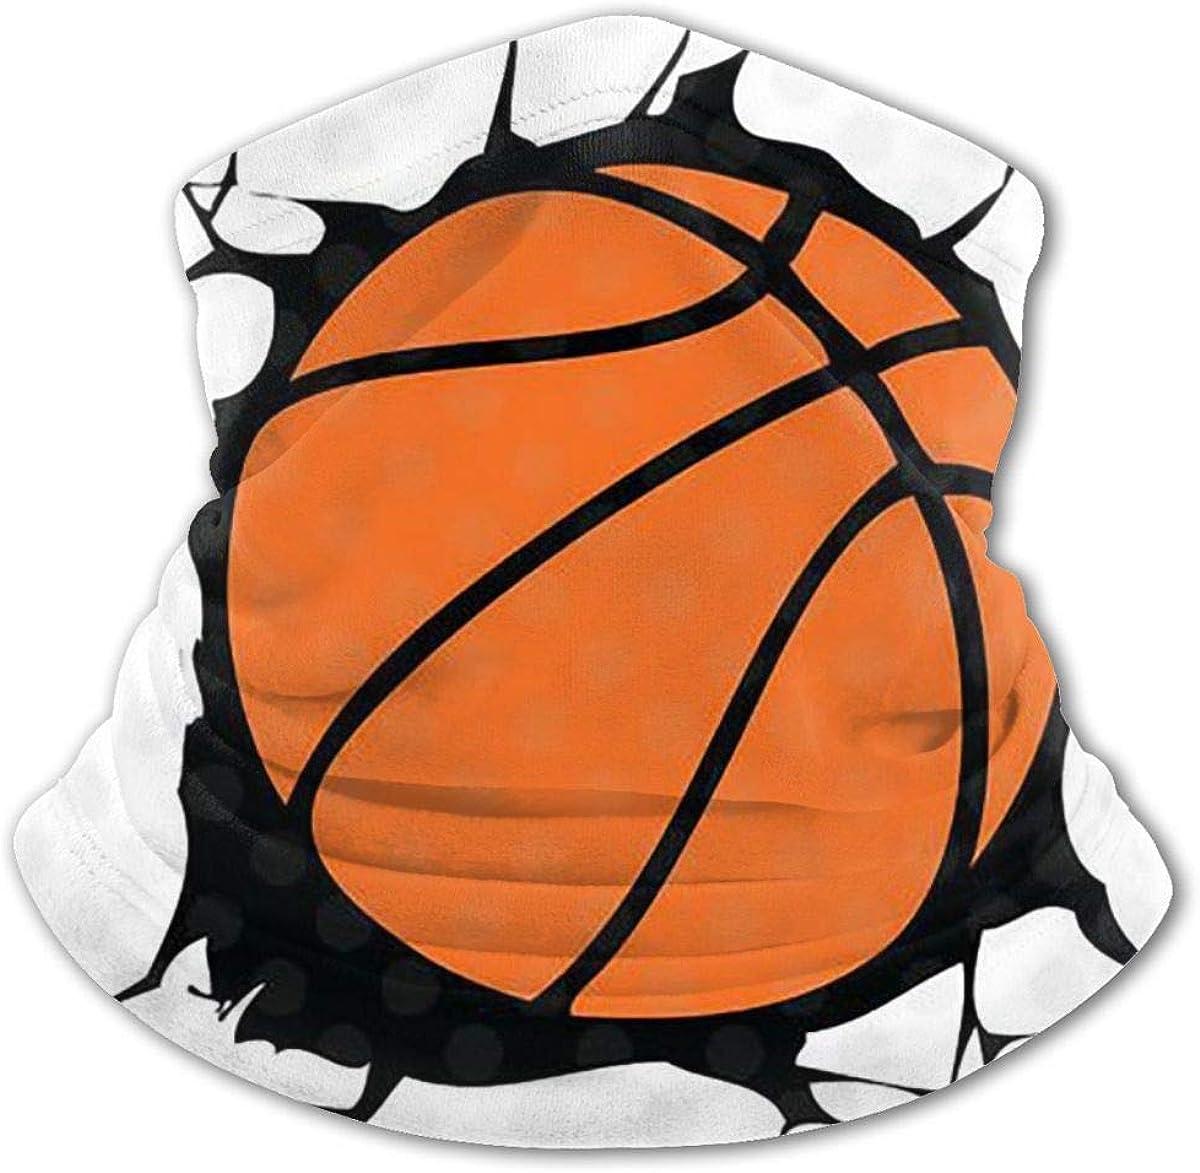 Basketball Headwear For Girls And Boys, Head Wrap, Neck Gaiter, Headband, Tenn Fishing Mask, Magic Scarf, Tube Mask, Face Bandana Mask For Camping Running Cycling